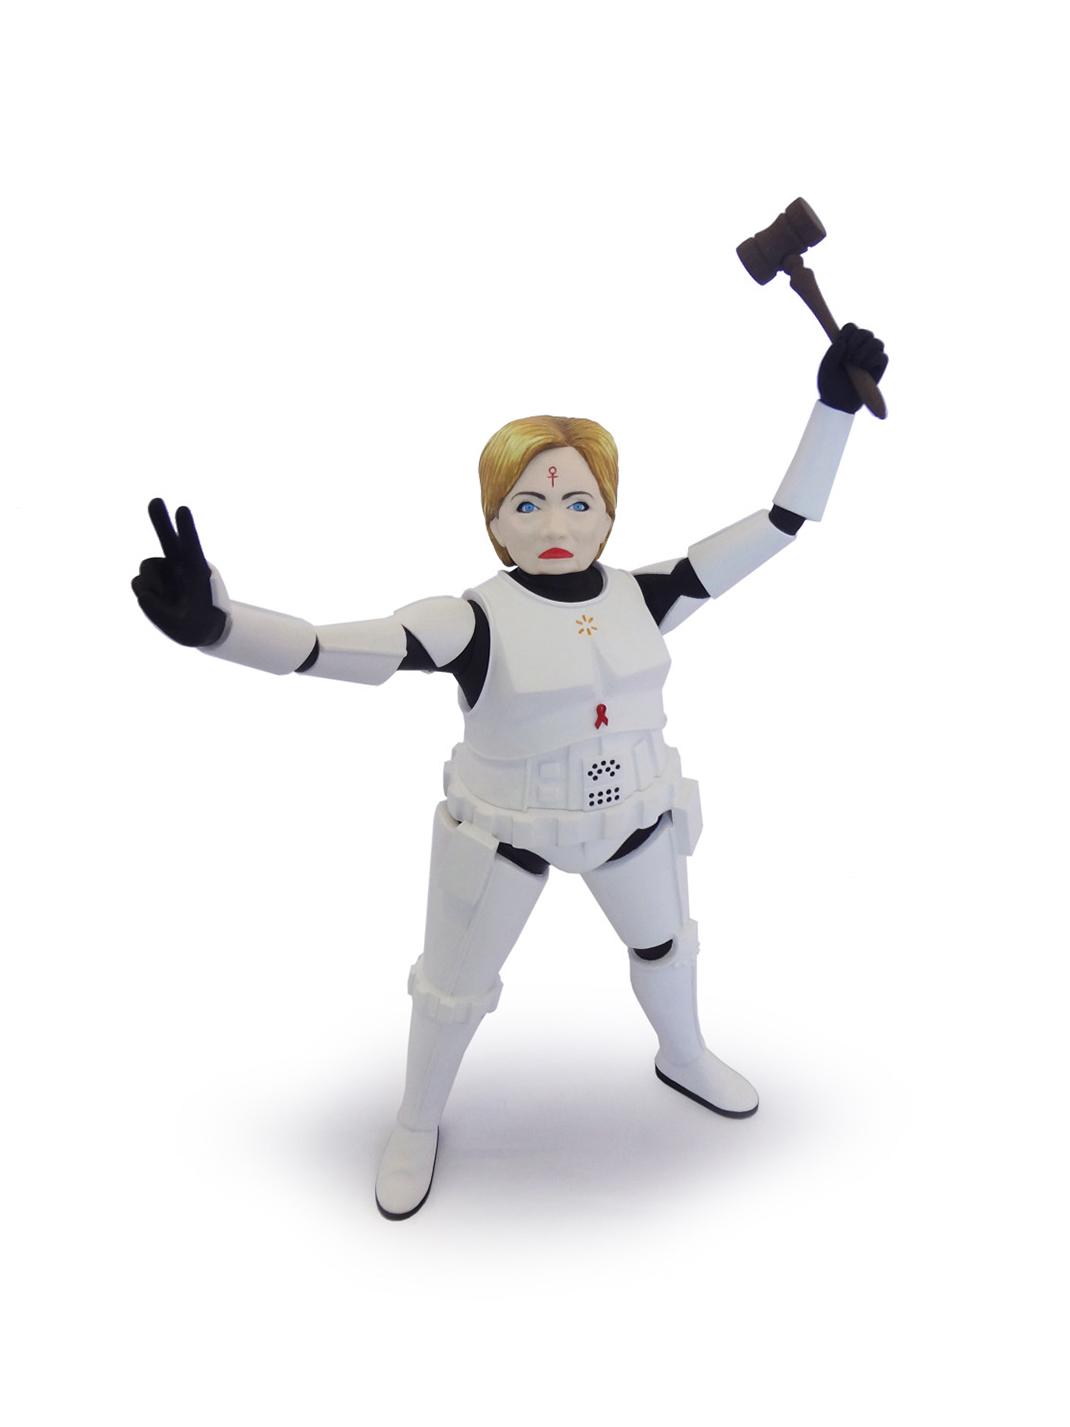 Hillary Clinton-Storm Trooper